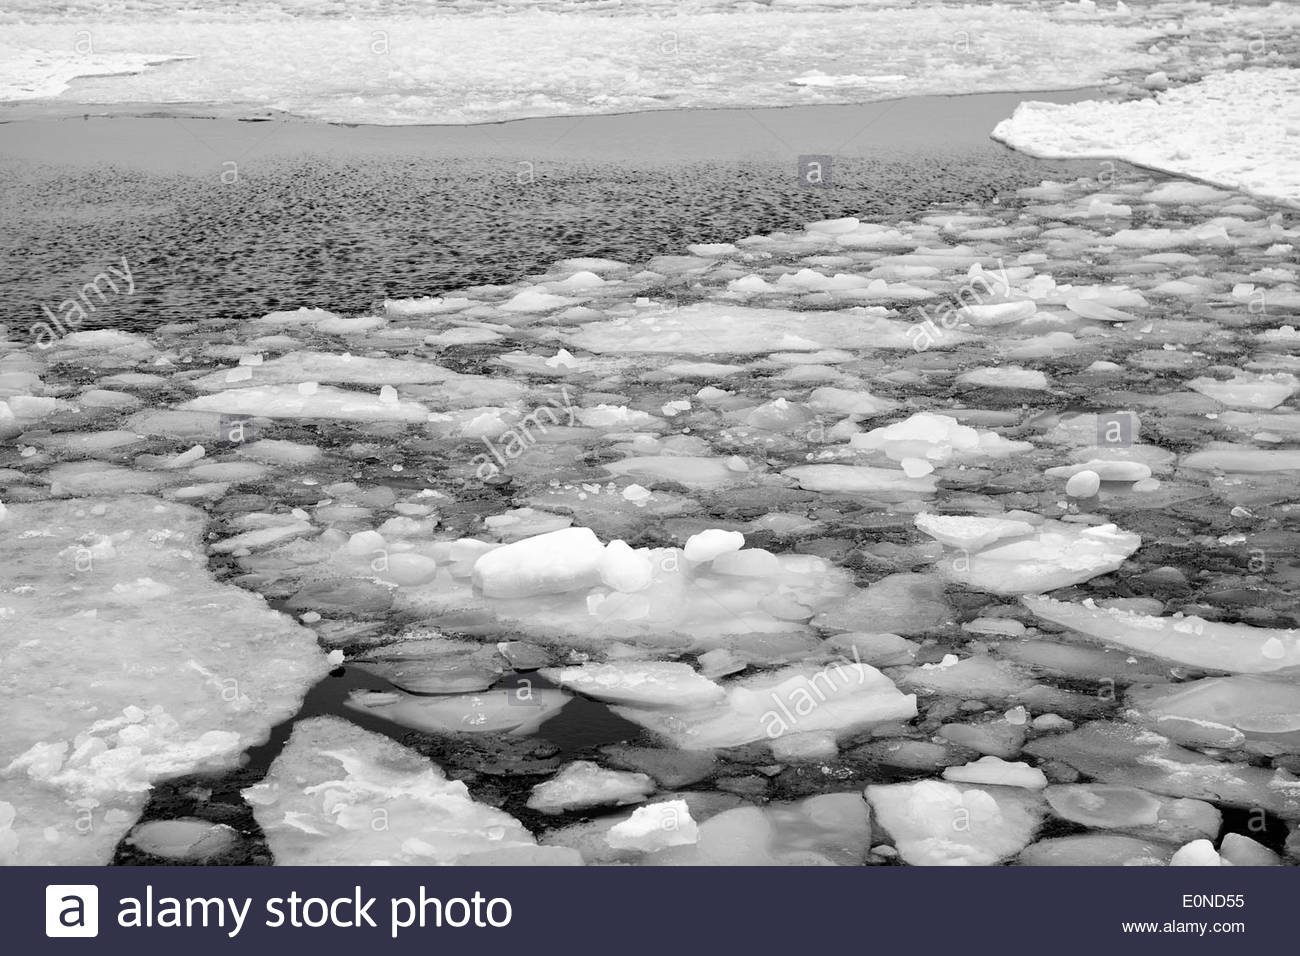 Winter in The Baltic Sea - Stock Image